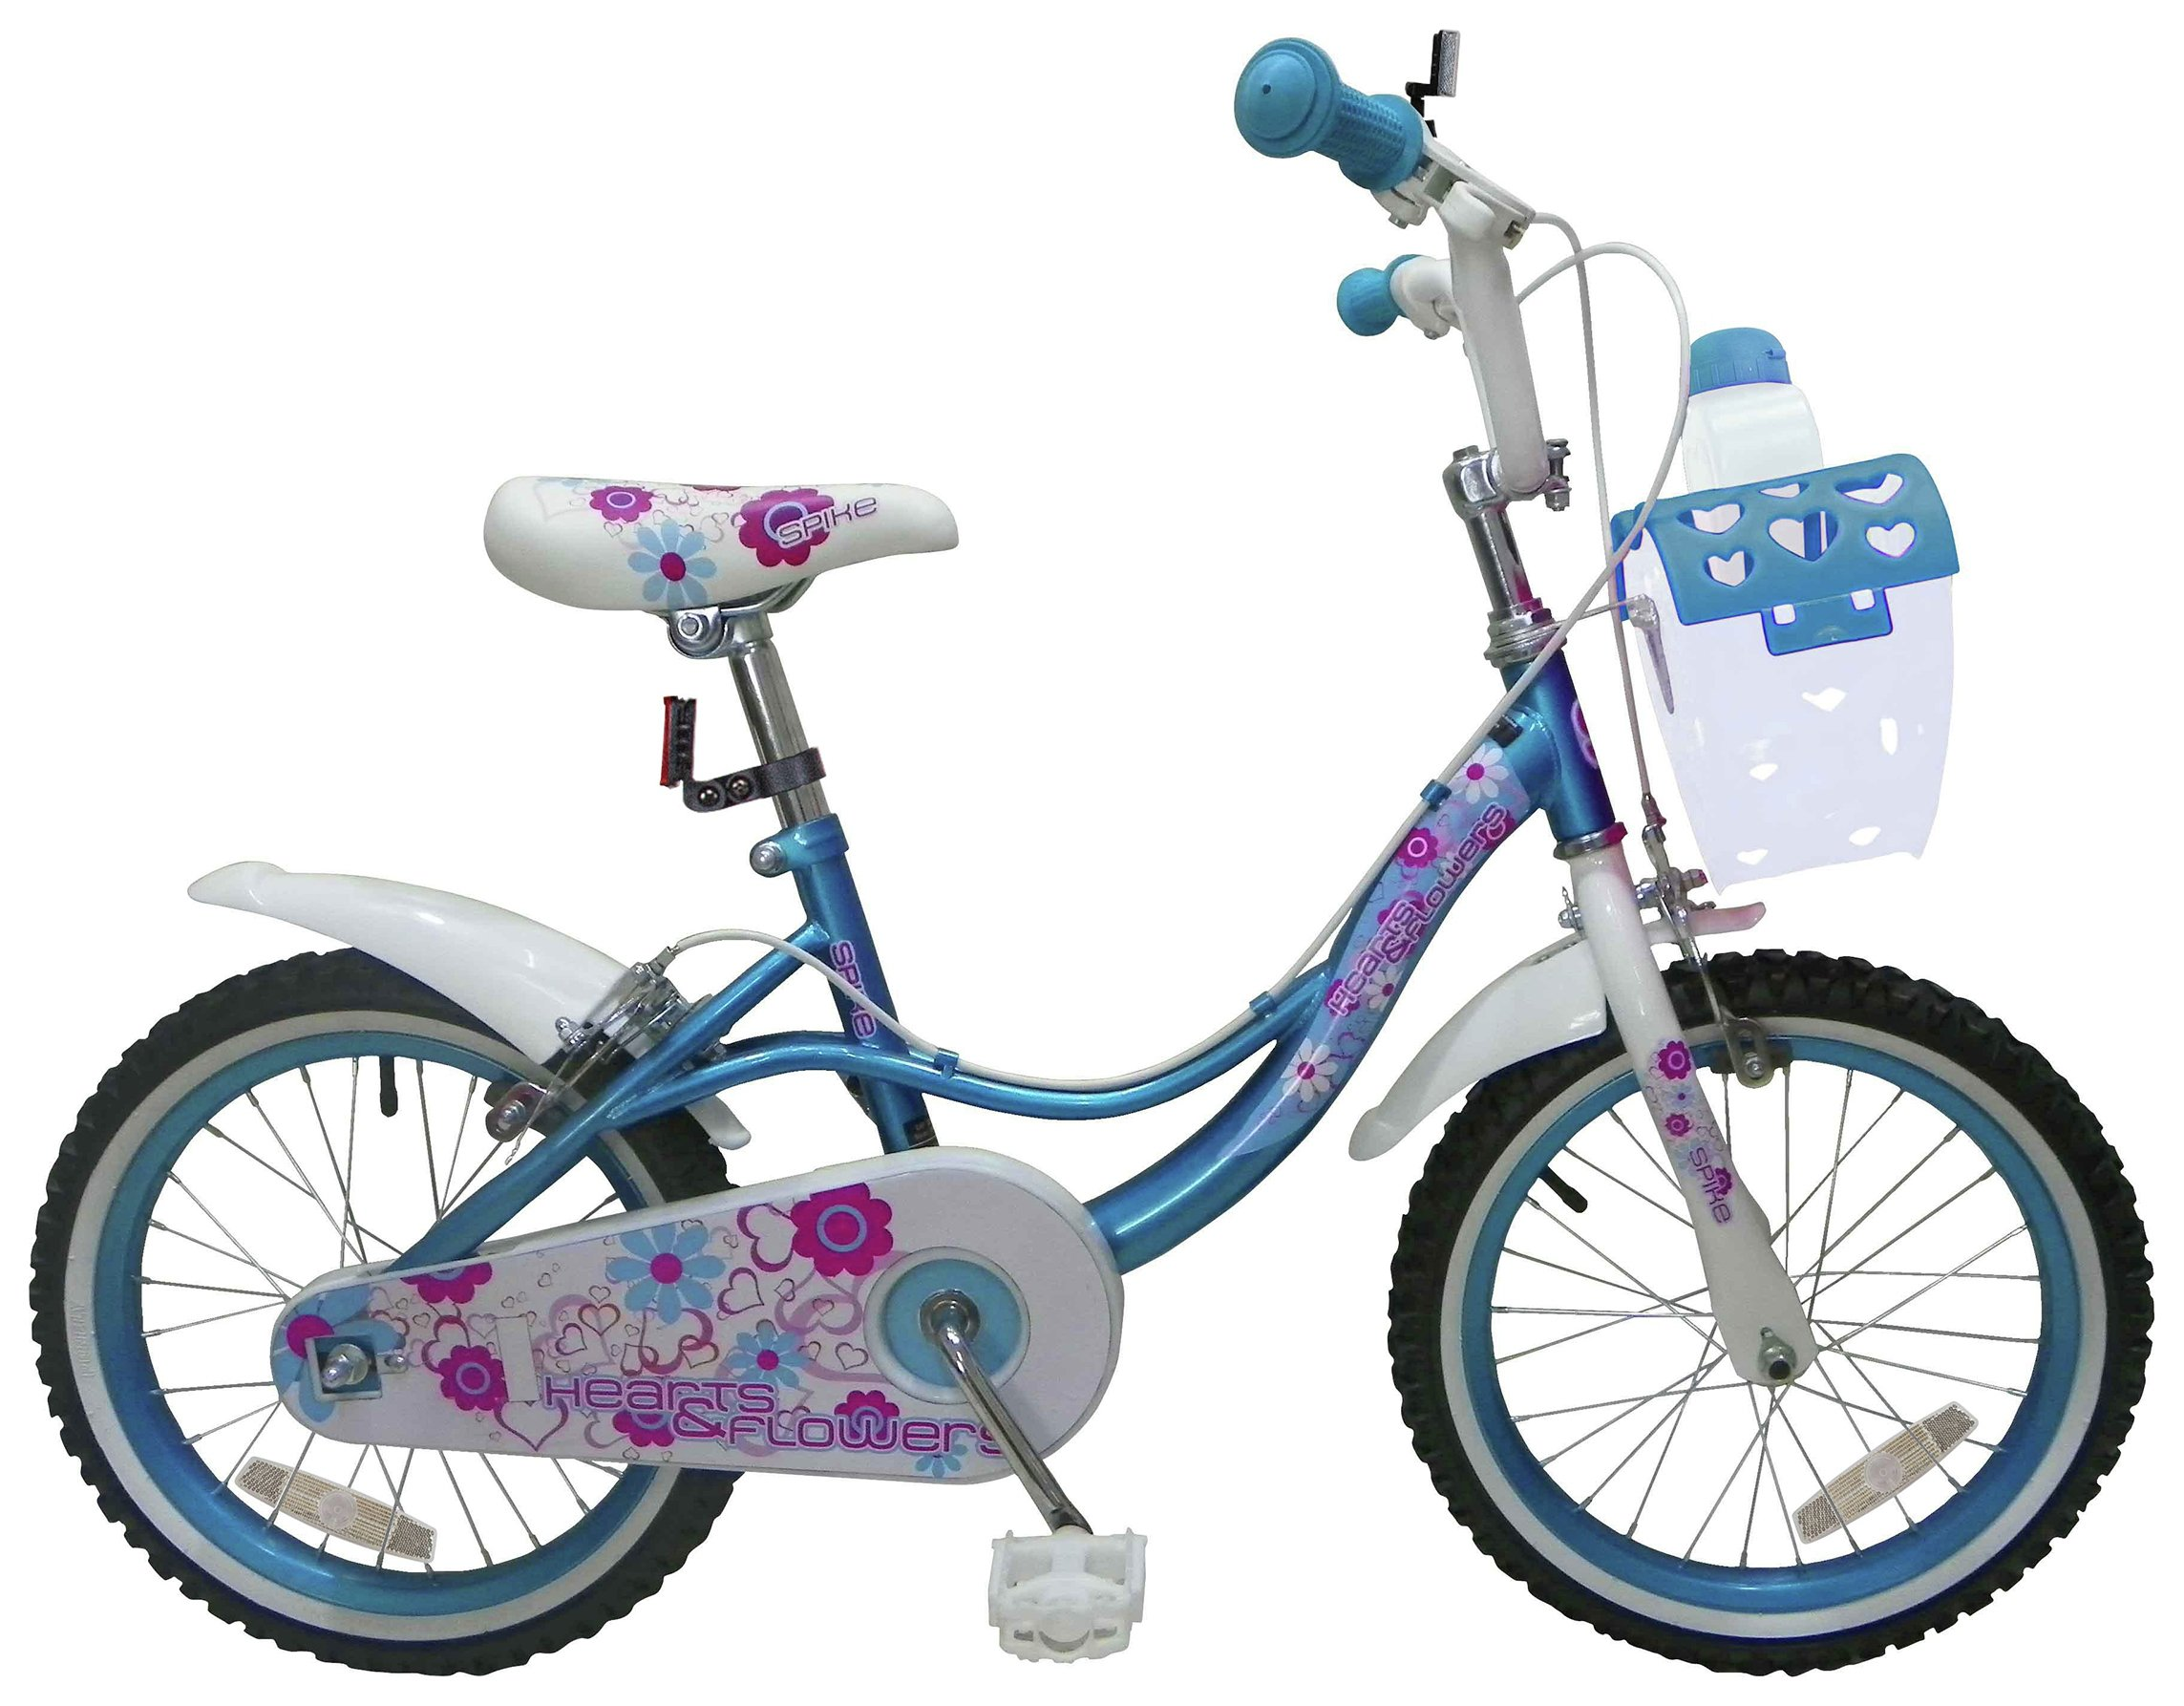 Spike 16 Inch Kids Bike with Basket